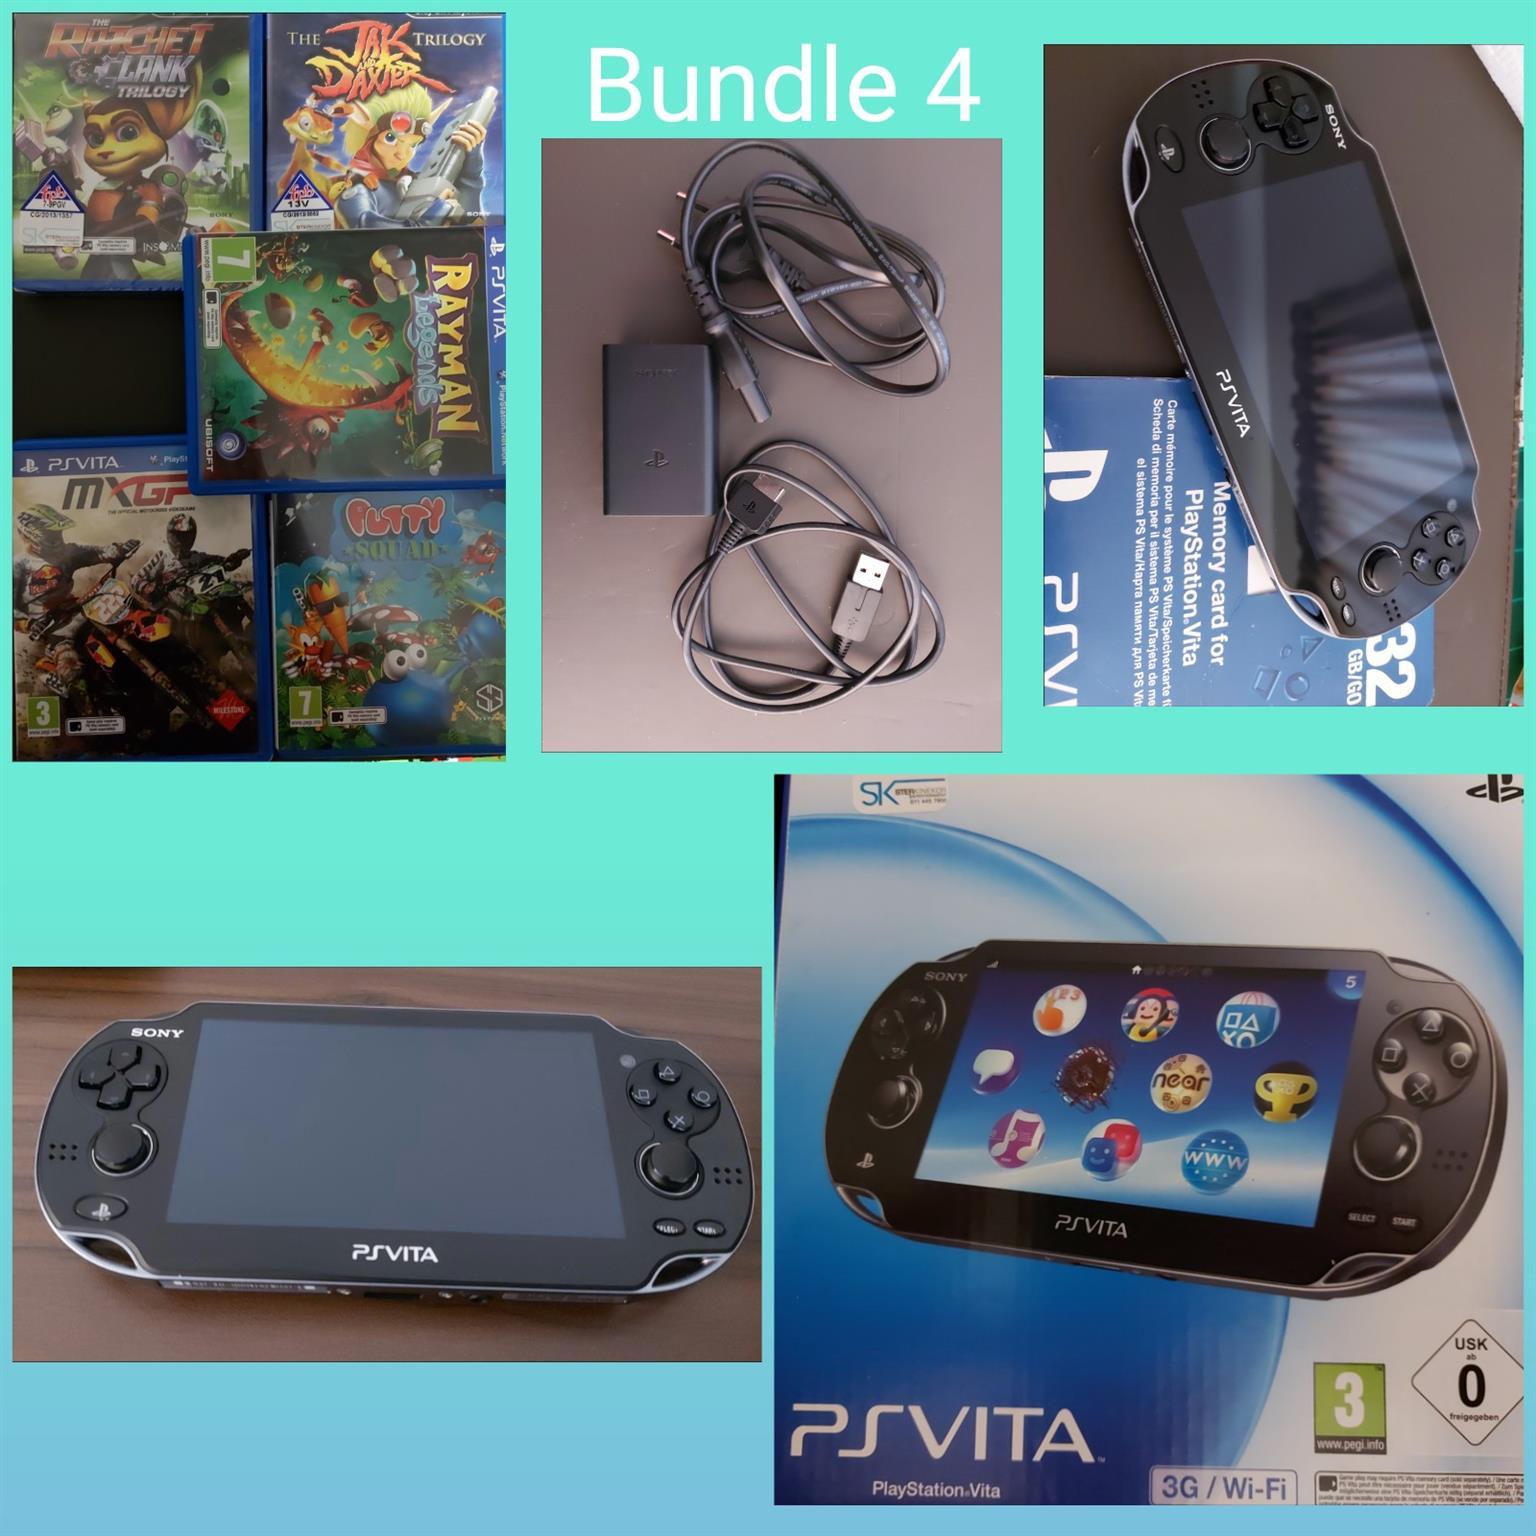 PS Vita with games bundle 4